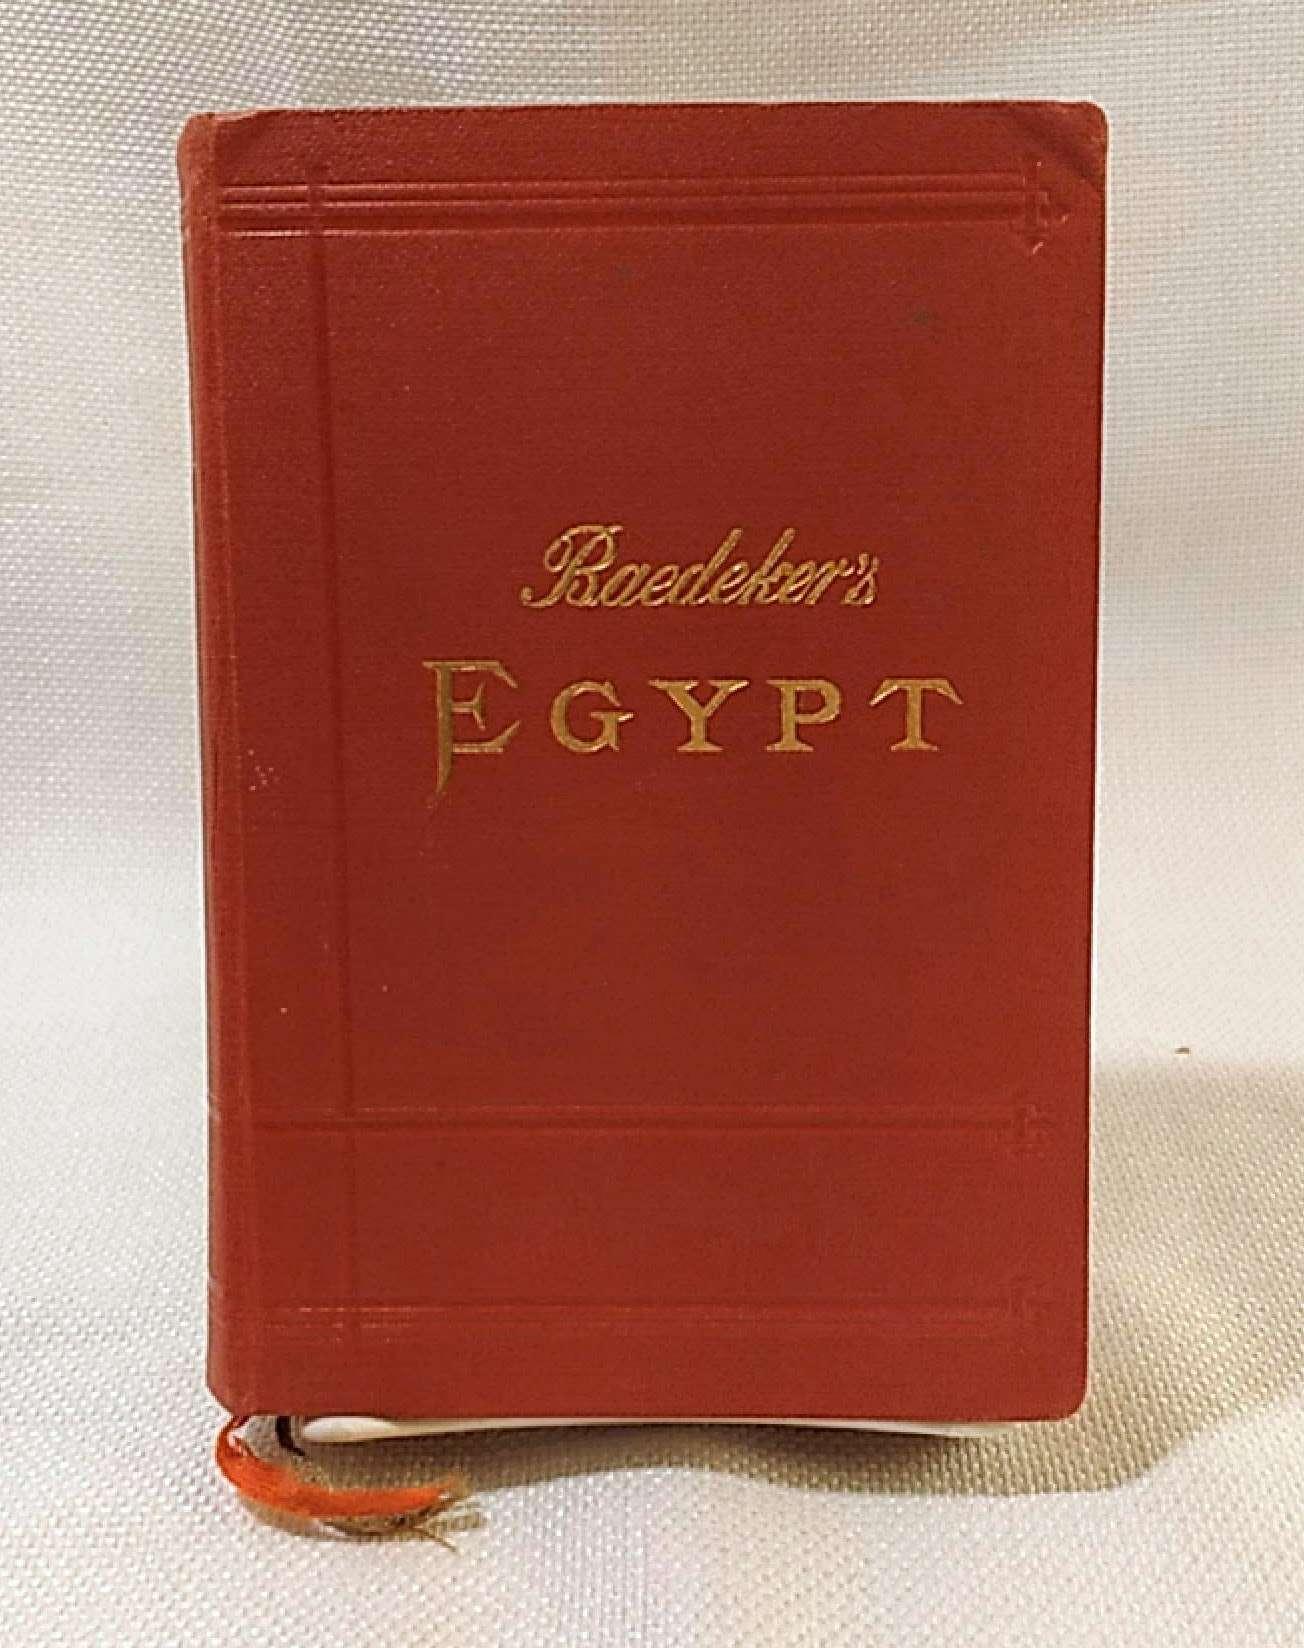 Egypt and The Sudan, Handbook for Travellers by Karl Baedeker. 1914. Cloth., Karl Baedeker